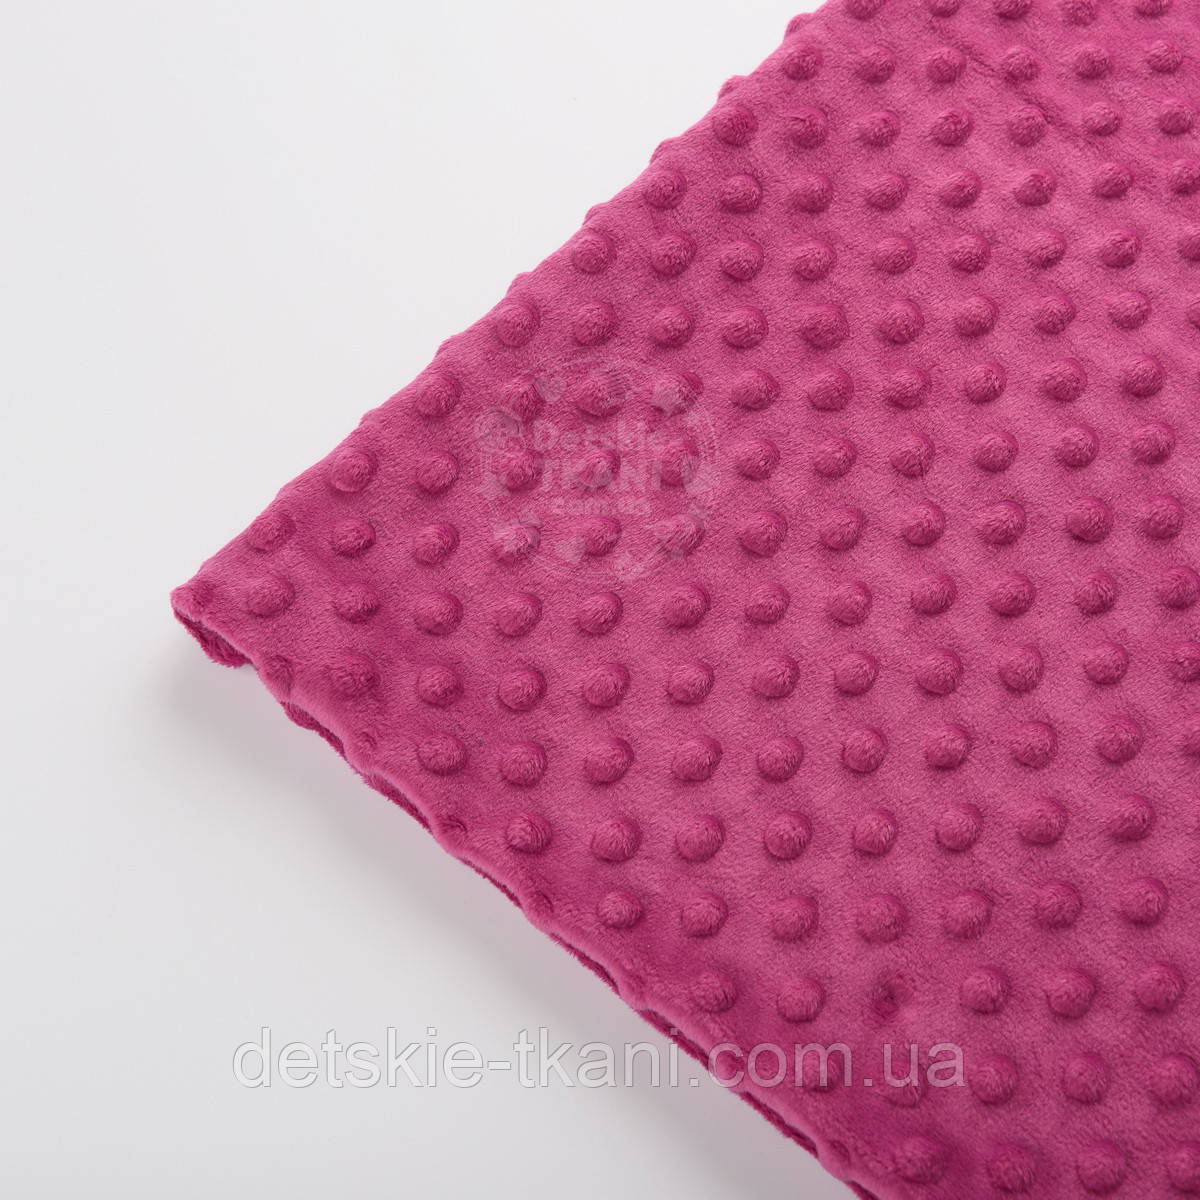 Отрез плюш minky М-18 размером 40*40 см розово-сиреневого цвета